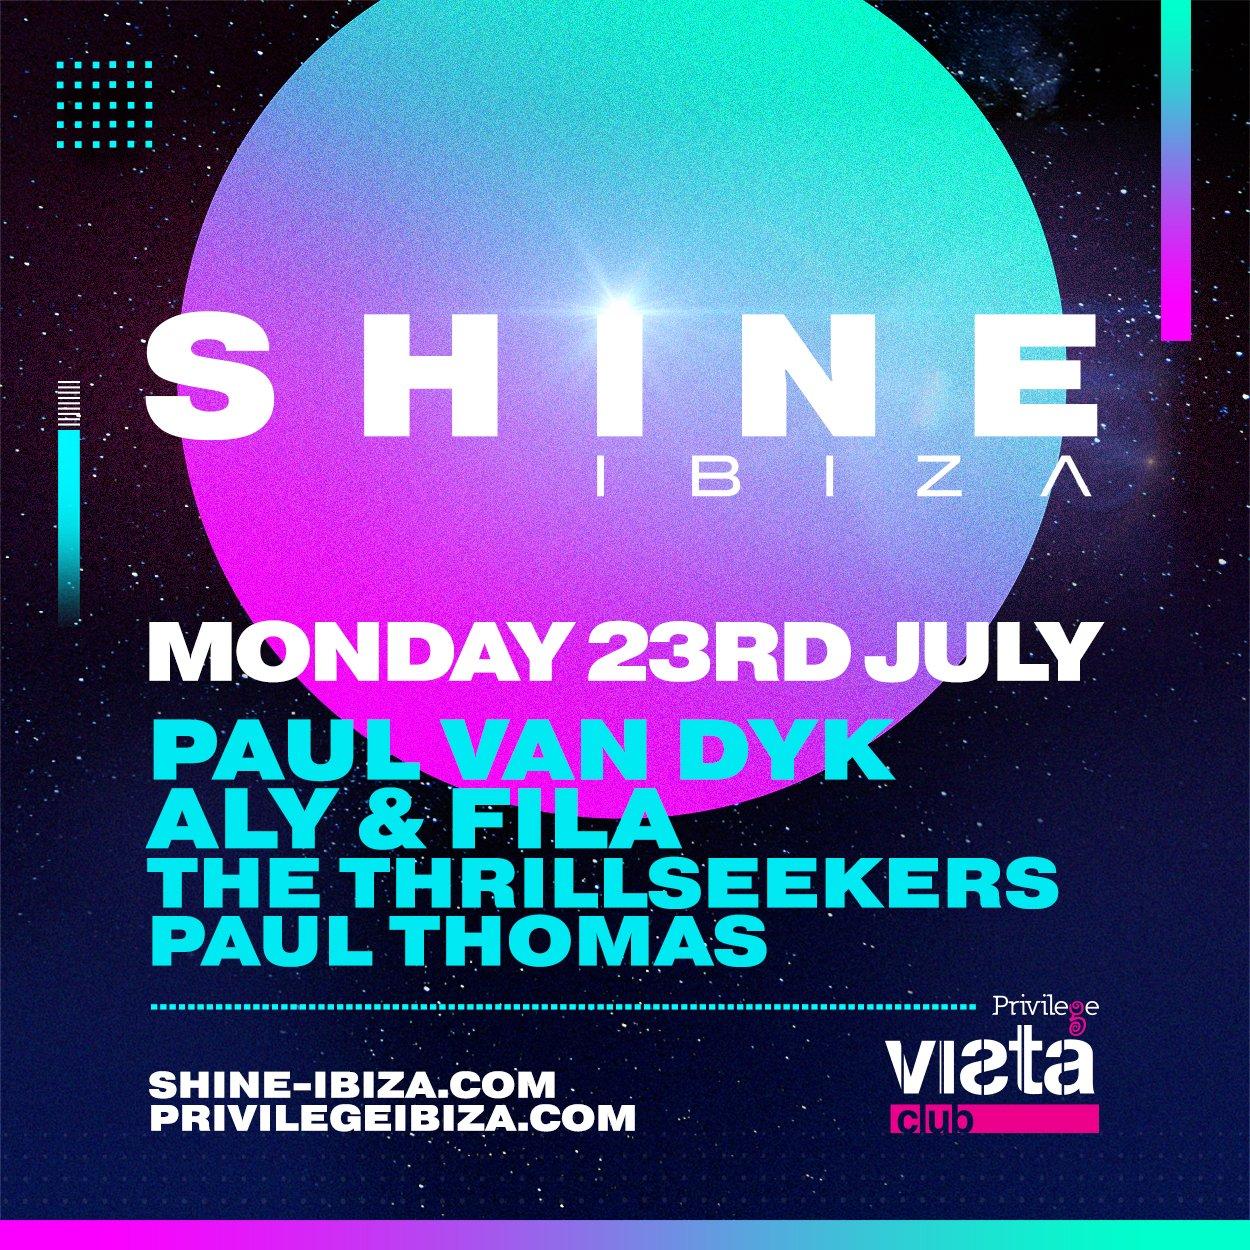 I love Mondays at @SHINE_Ibiza https://t.co/WYpaIdUN7h https://t.co/wB5aT97qnP